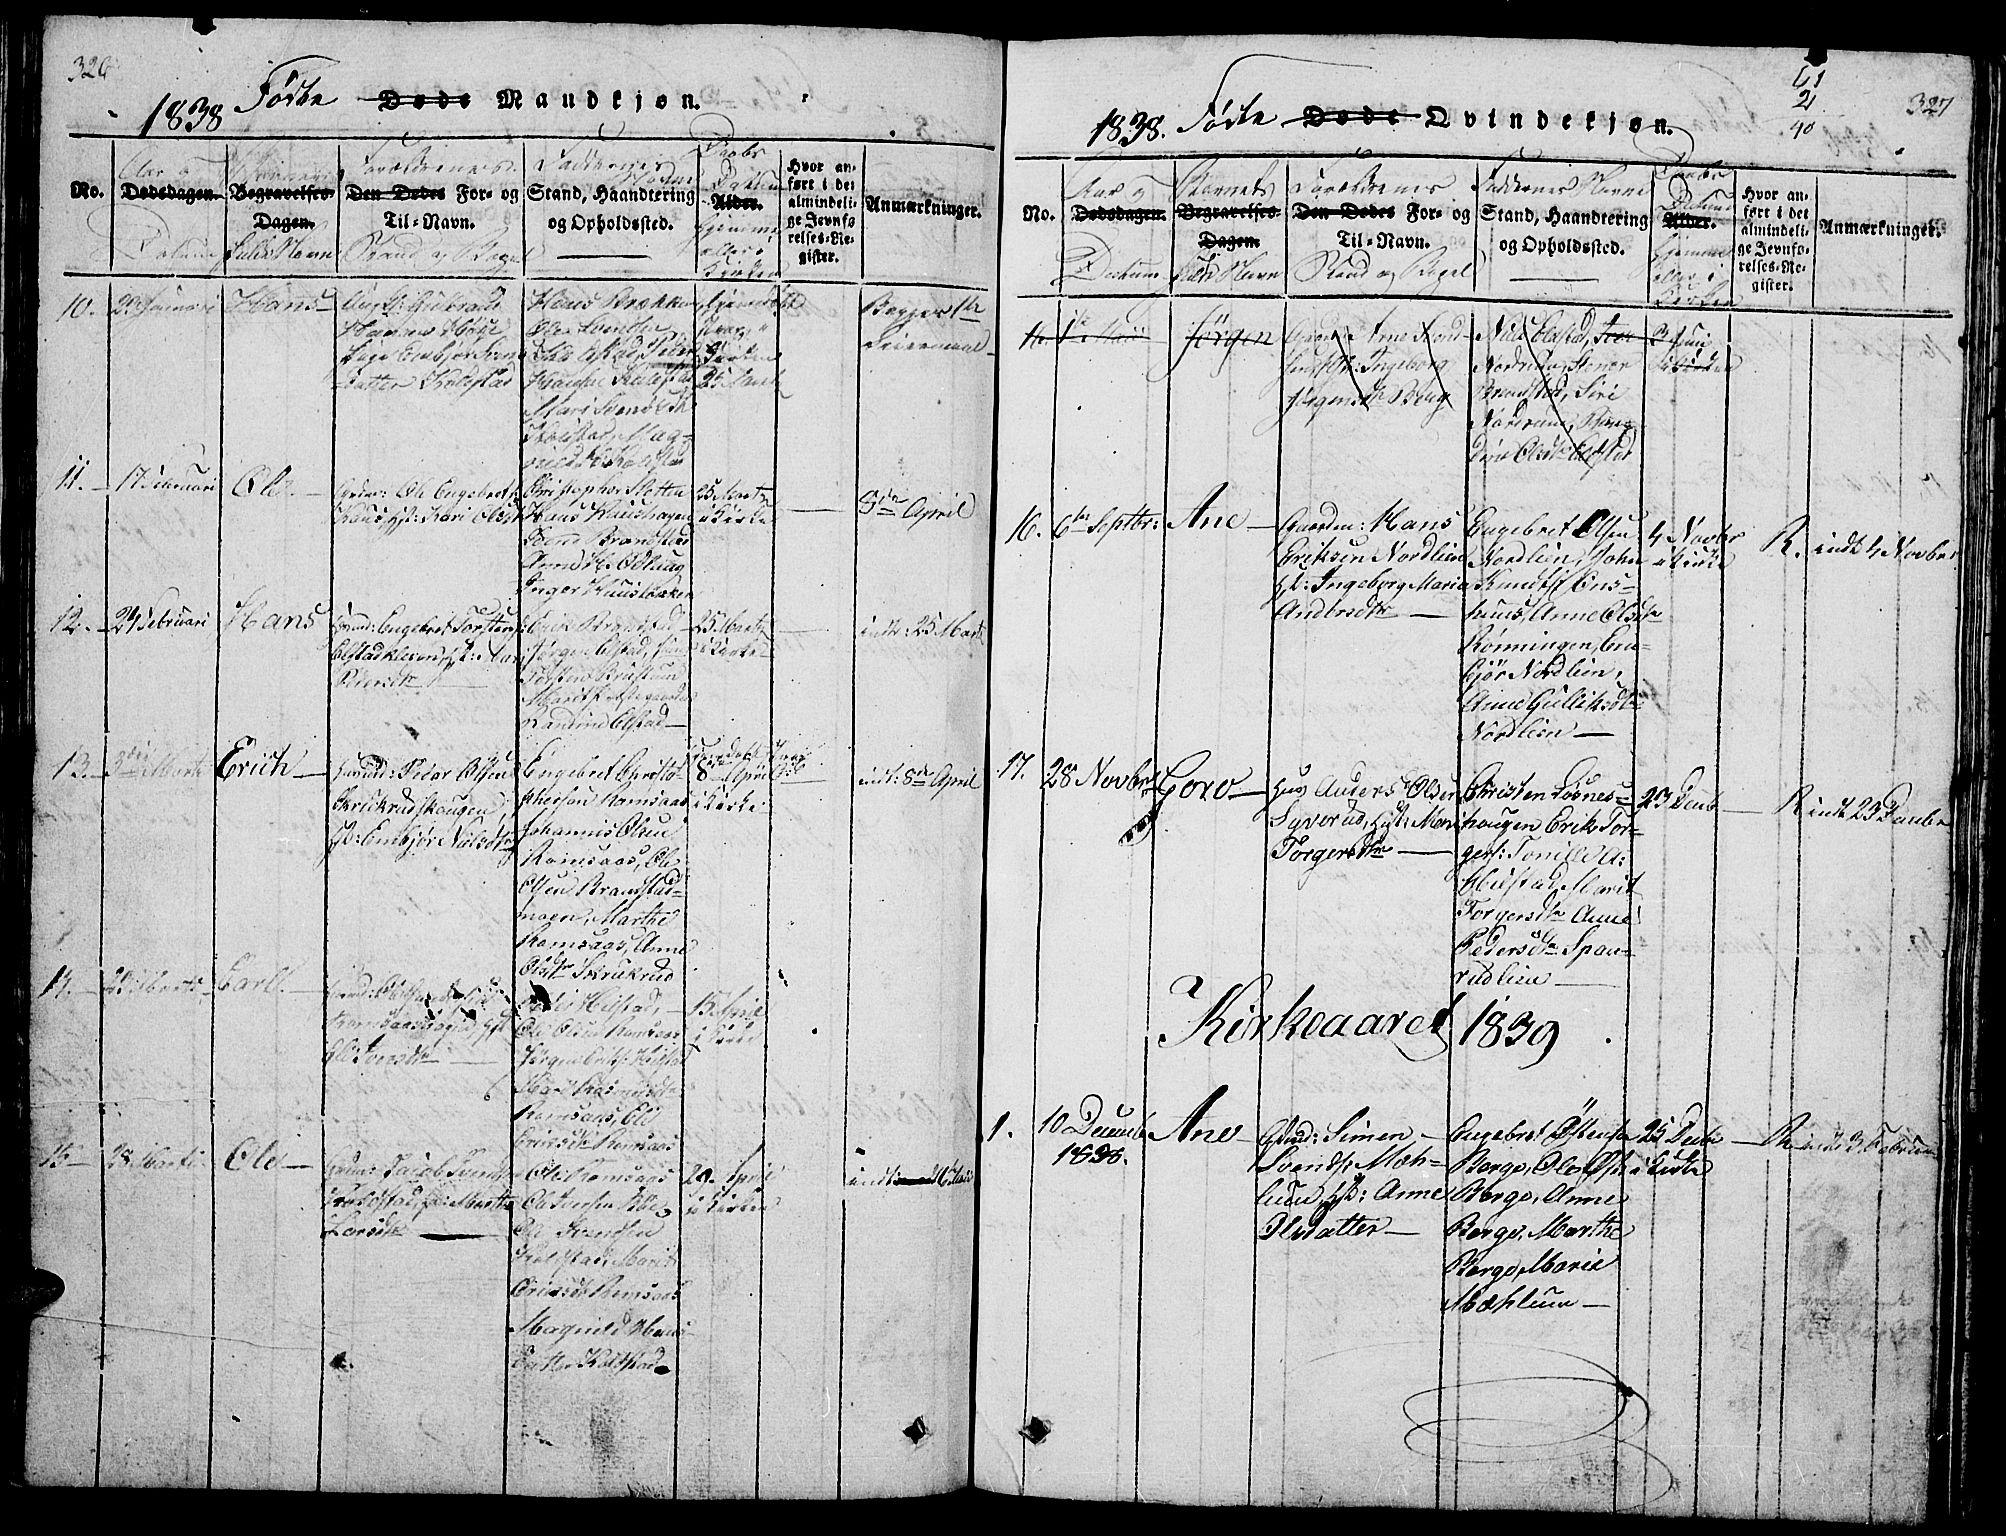 SAH, Ringebu prestekontor, Klokkerbok nr. 1, 1821-1839, s. 326-327